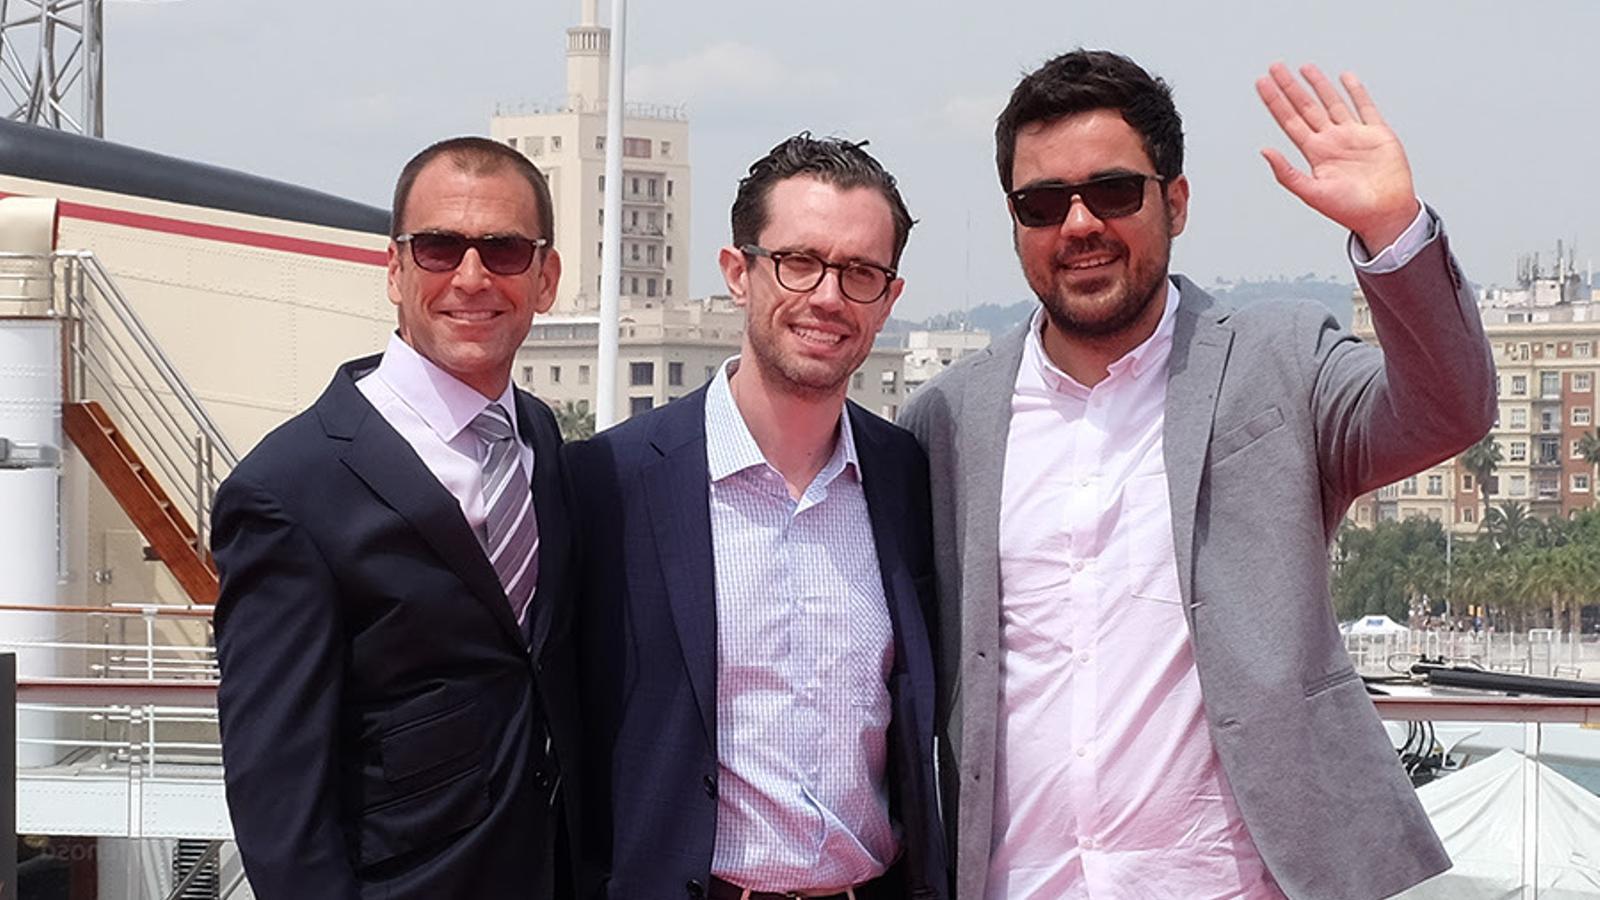 De dreta a esquerra, Carles Torras, director de 'Callback', Martín Bacigalupo, actor protagonista, i Timothy Gibbs, actor secundari